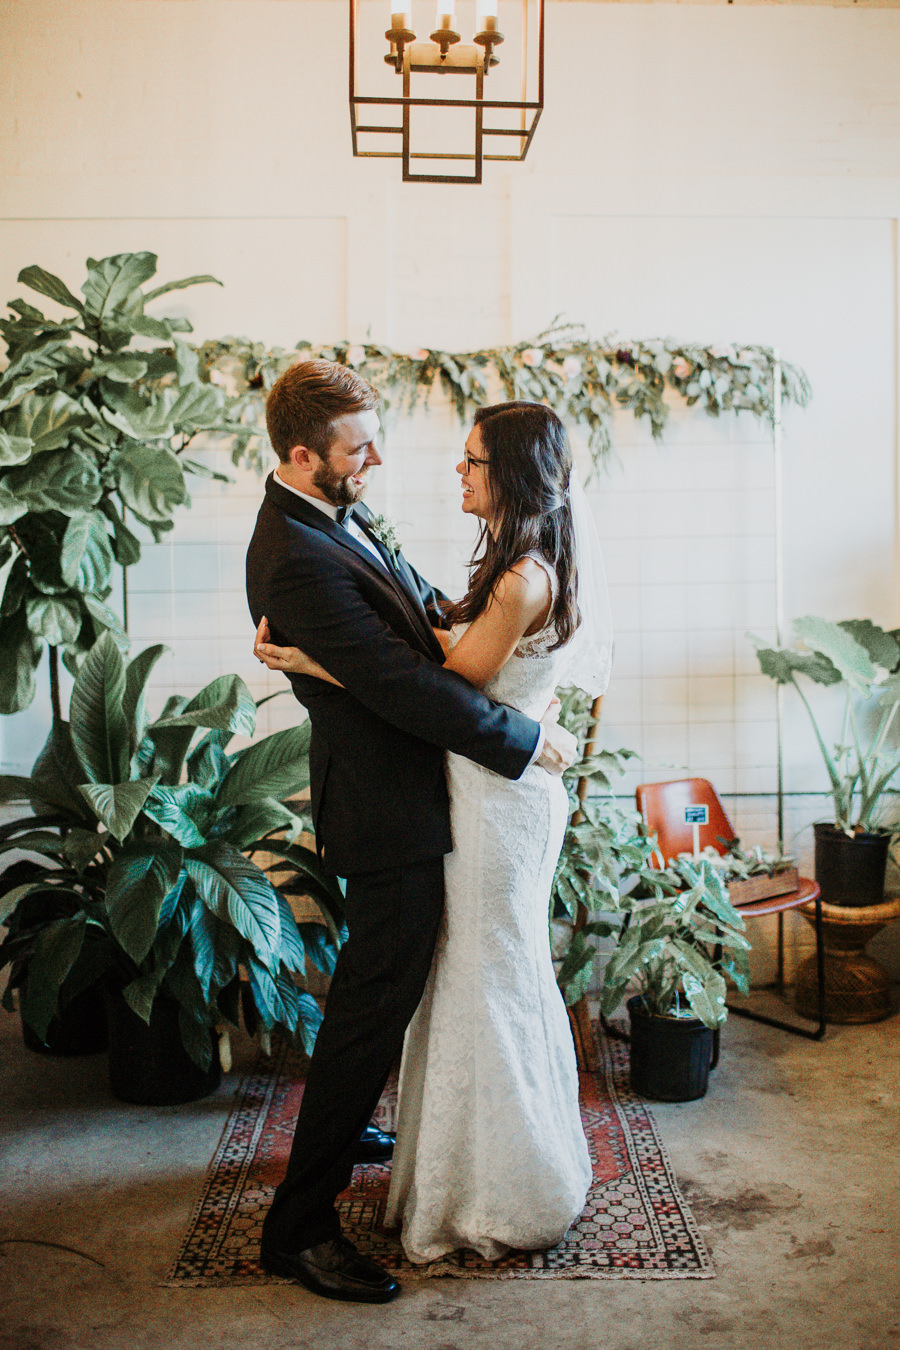 Tampa Heights Industrial Wedding at Cavu Emmy RJ-175.jpg